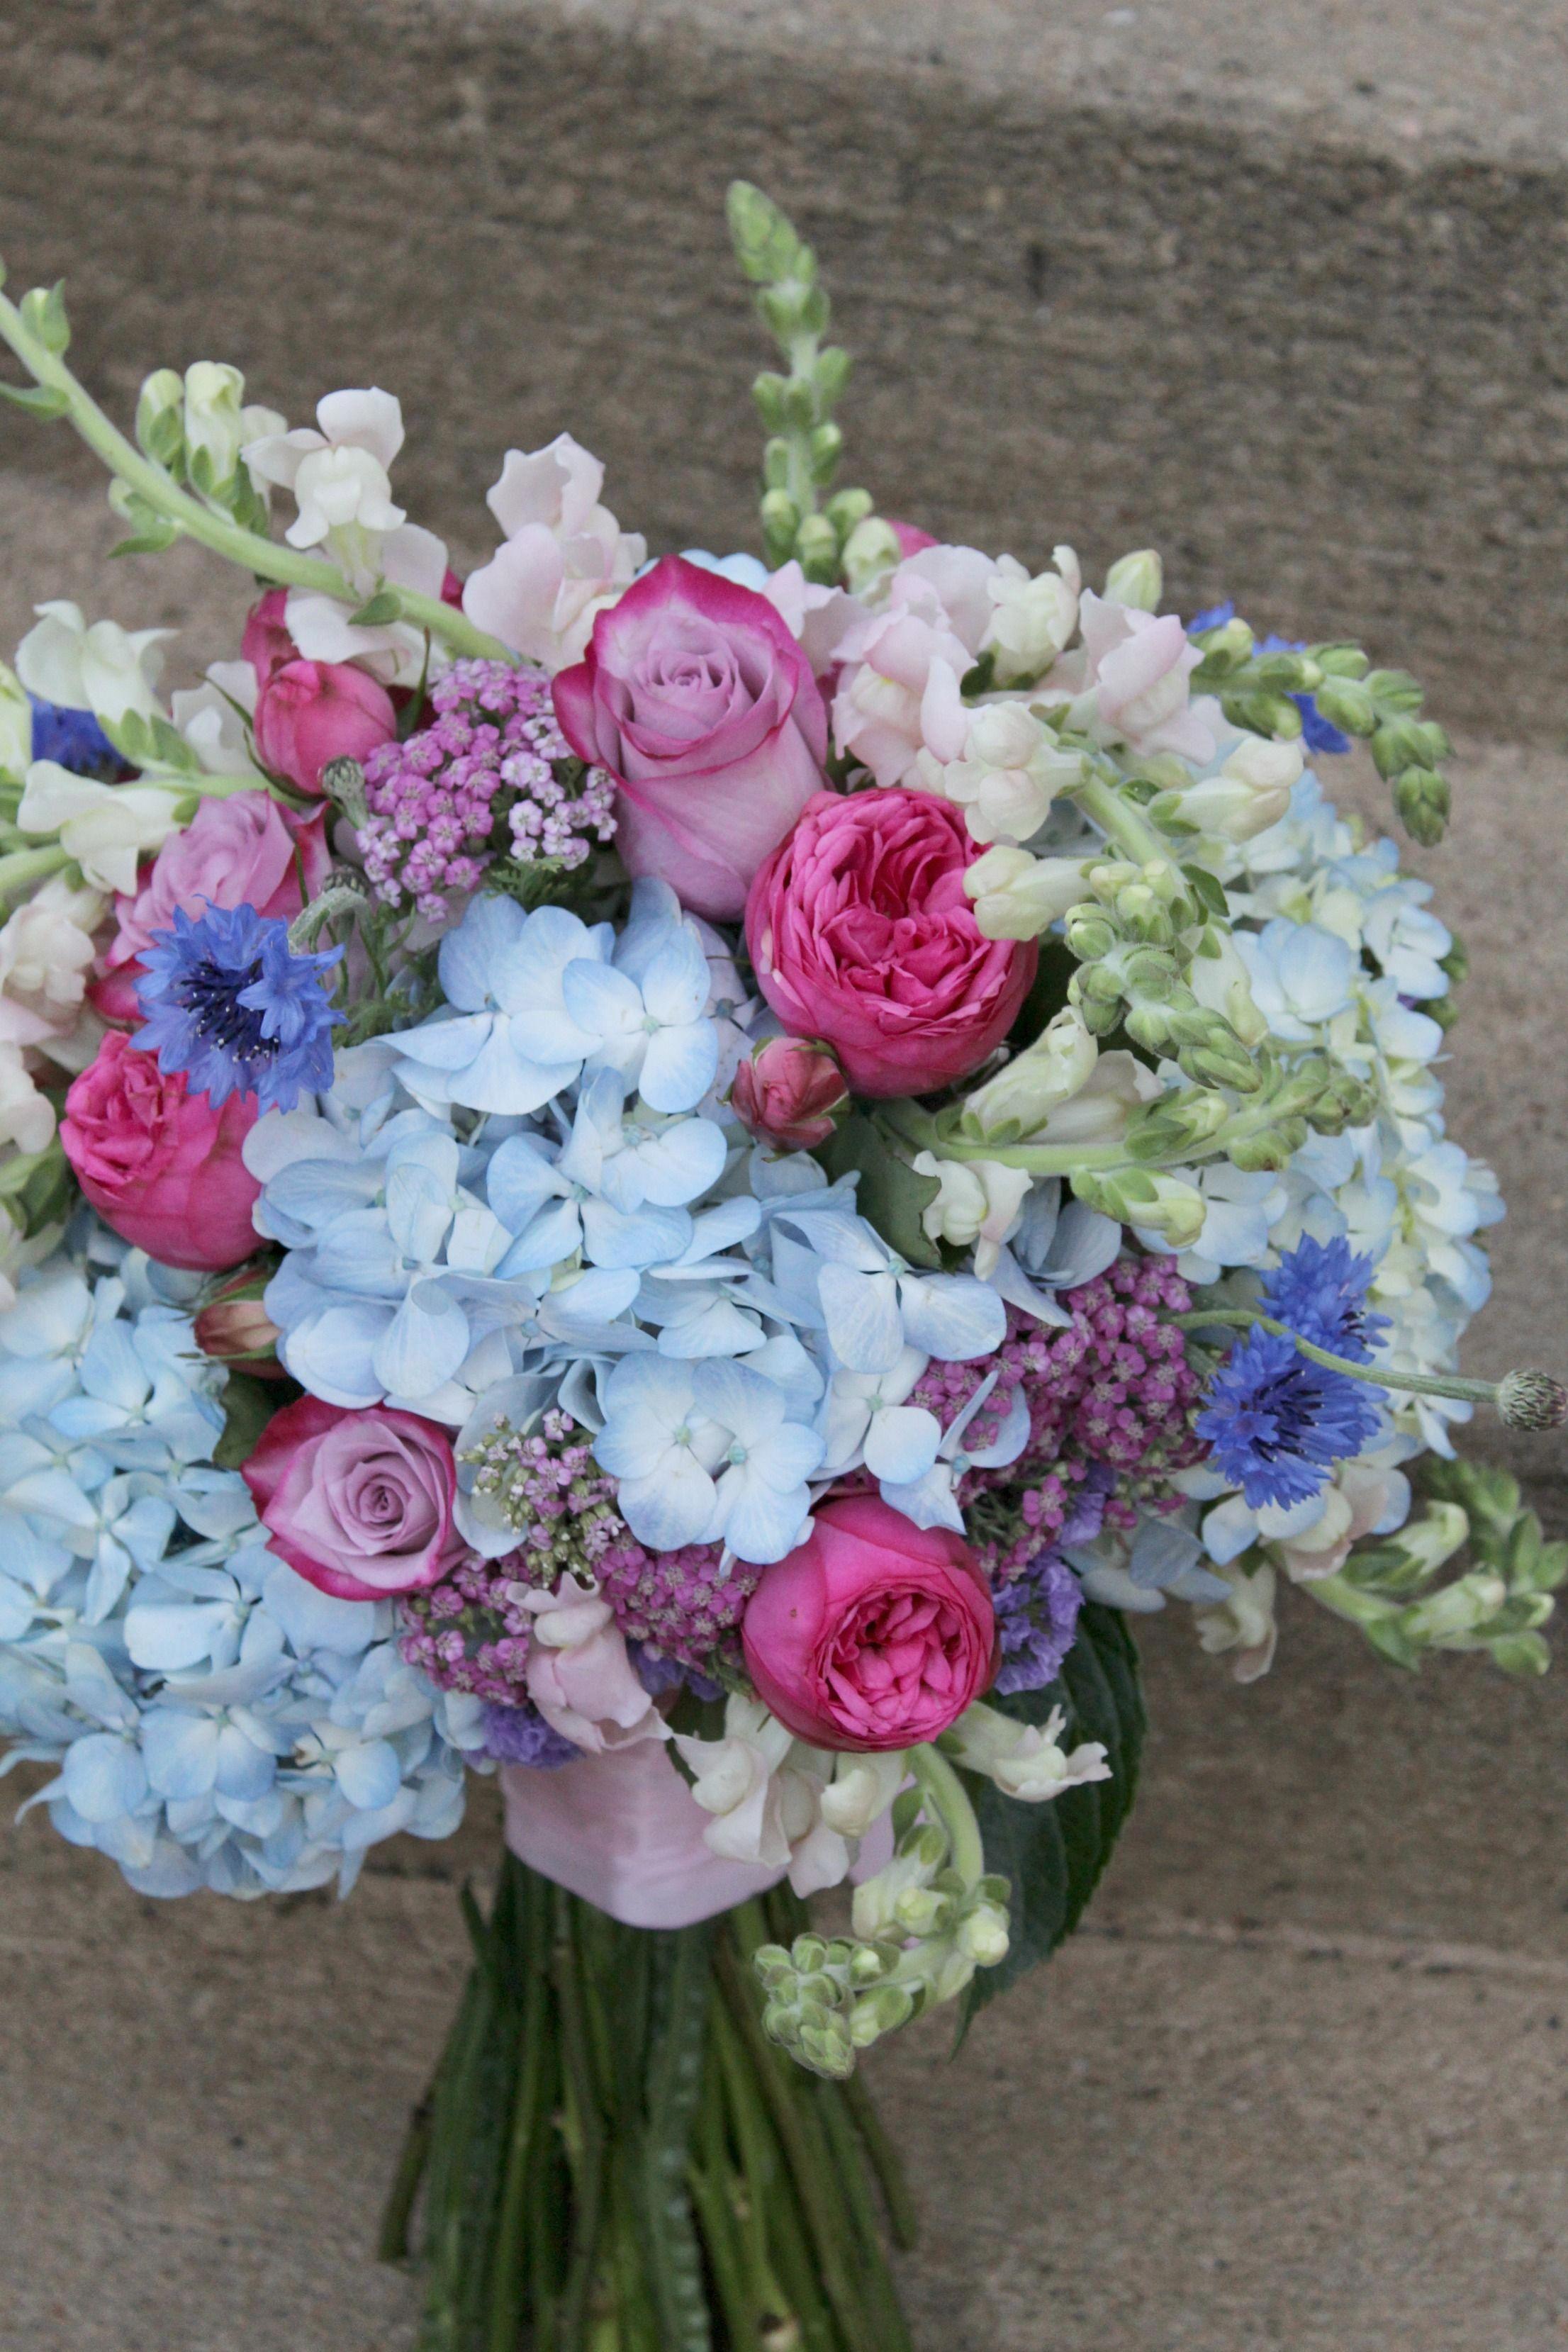 Bridal Bouquet Made Up Fresh Blue Hydrangeas Light Pink Snap Dragons Blue Cornflowers Hydrangea Bridal Bouquet Prom Flowers Bouquet Pink Flower Arrangements